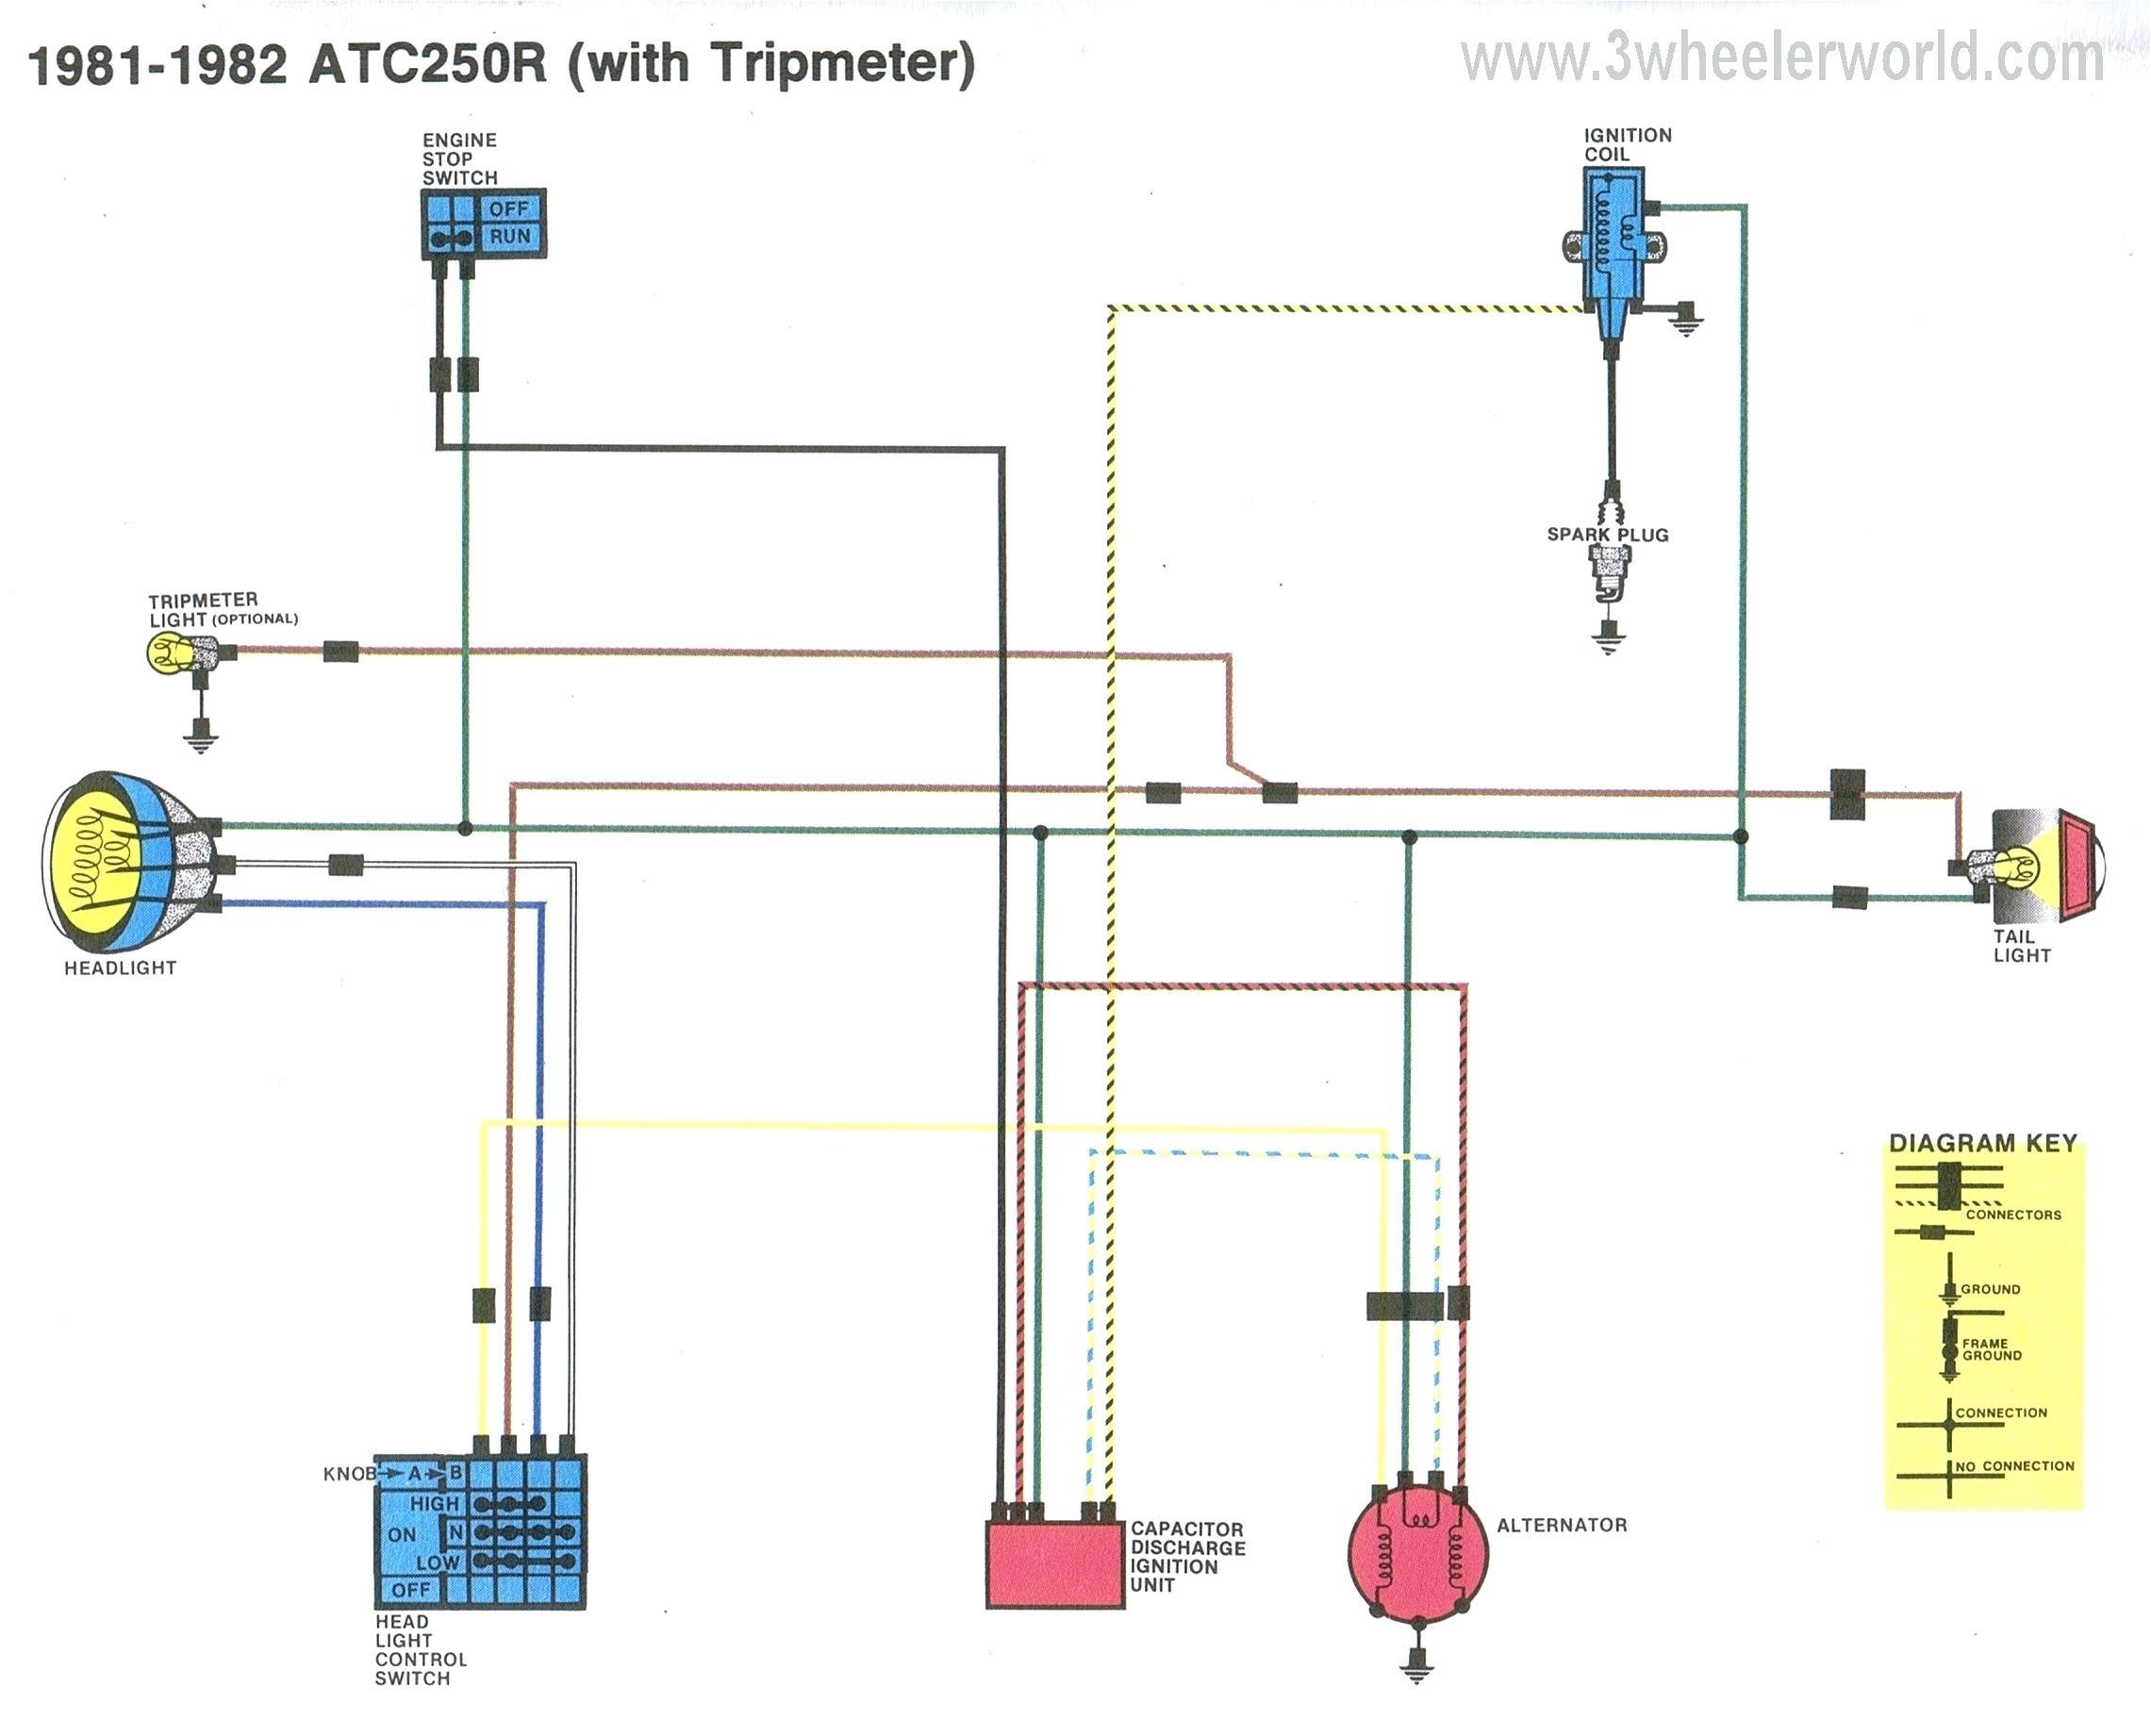 Honda 70 Engine Diagram Honda Xrm 125 Headlight Wiring Diagram Rs Electrical Schematic Of Honda 70 Engine Diagram